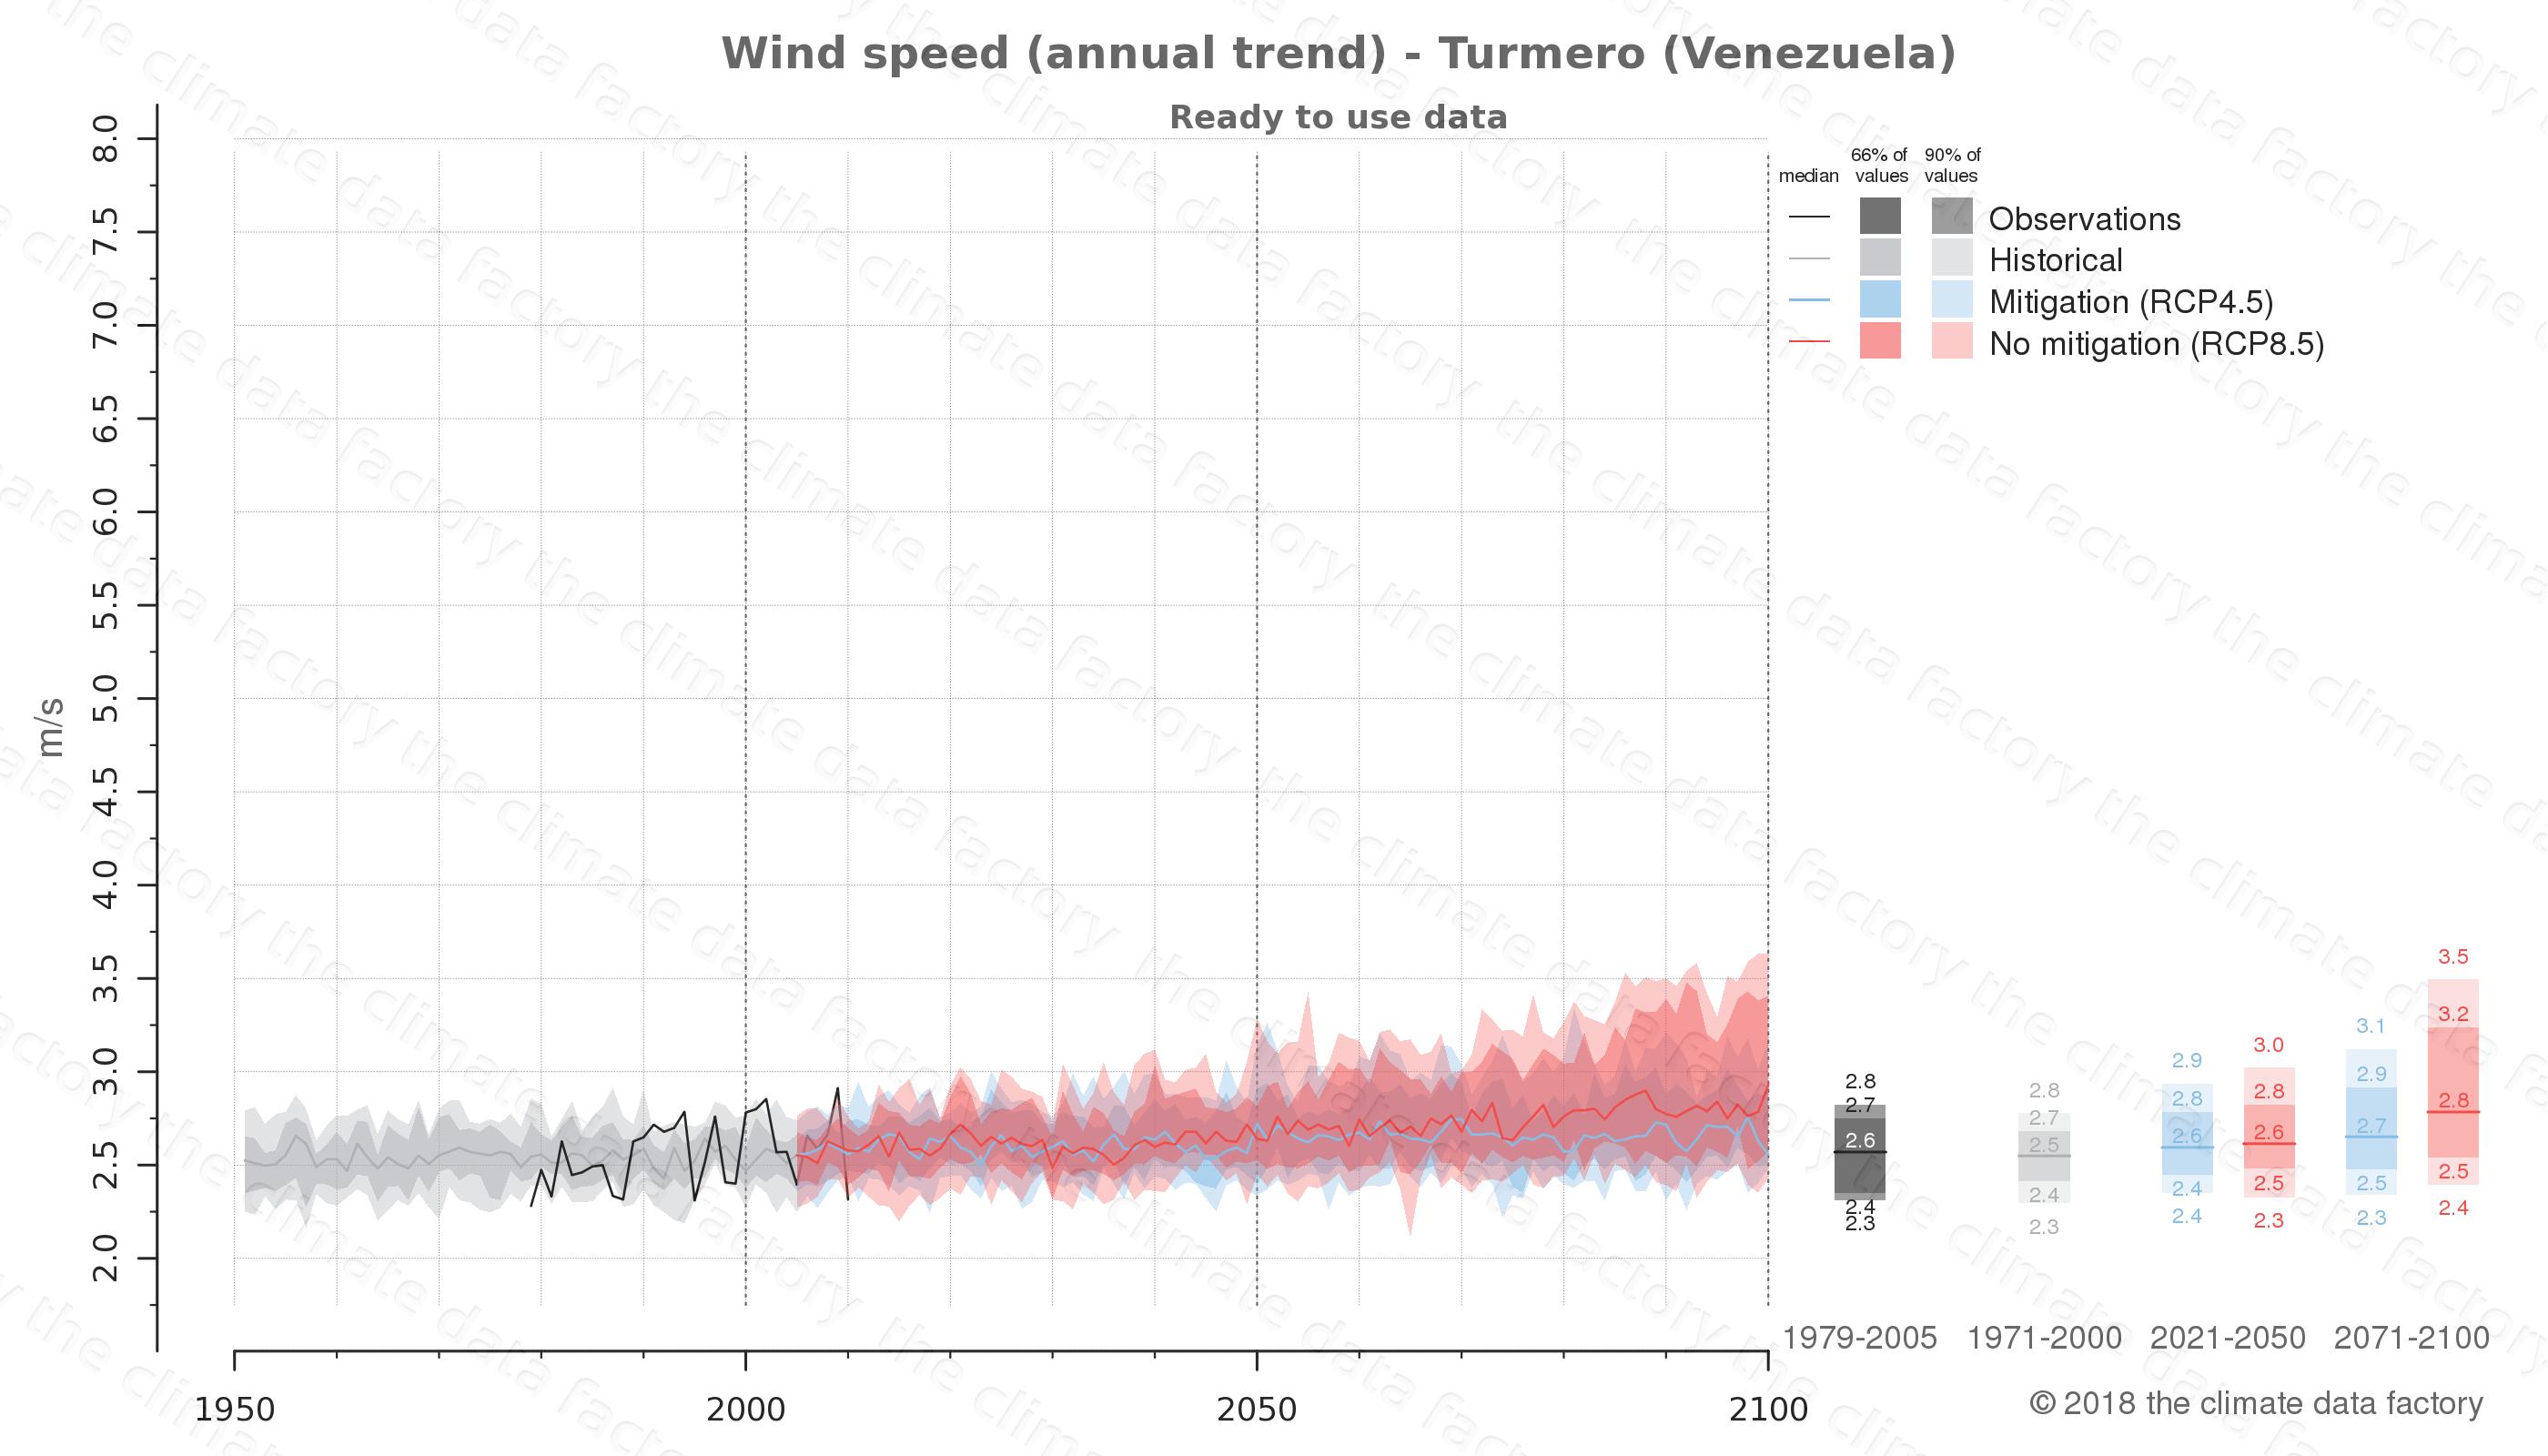 climate change data policy adaptation climate graph city data wind-speed turmero venezuela